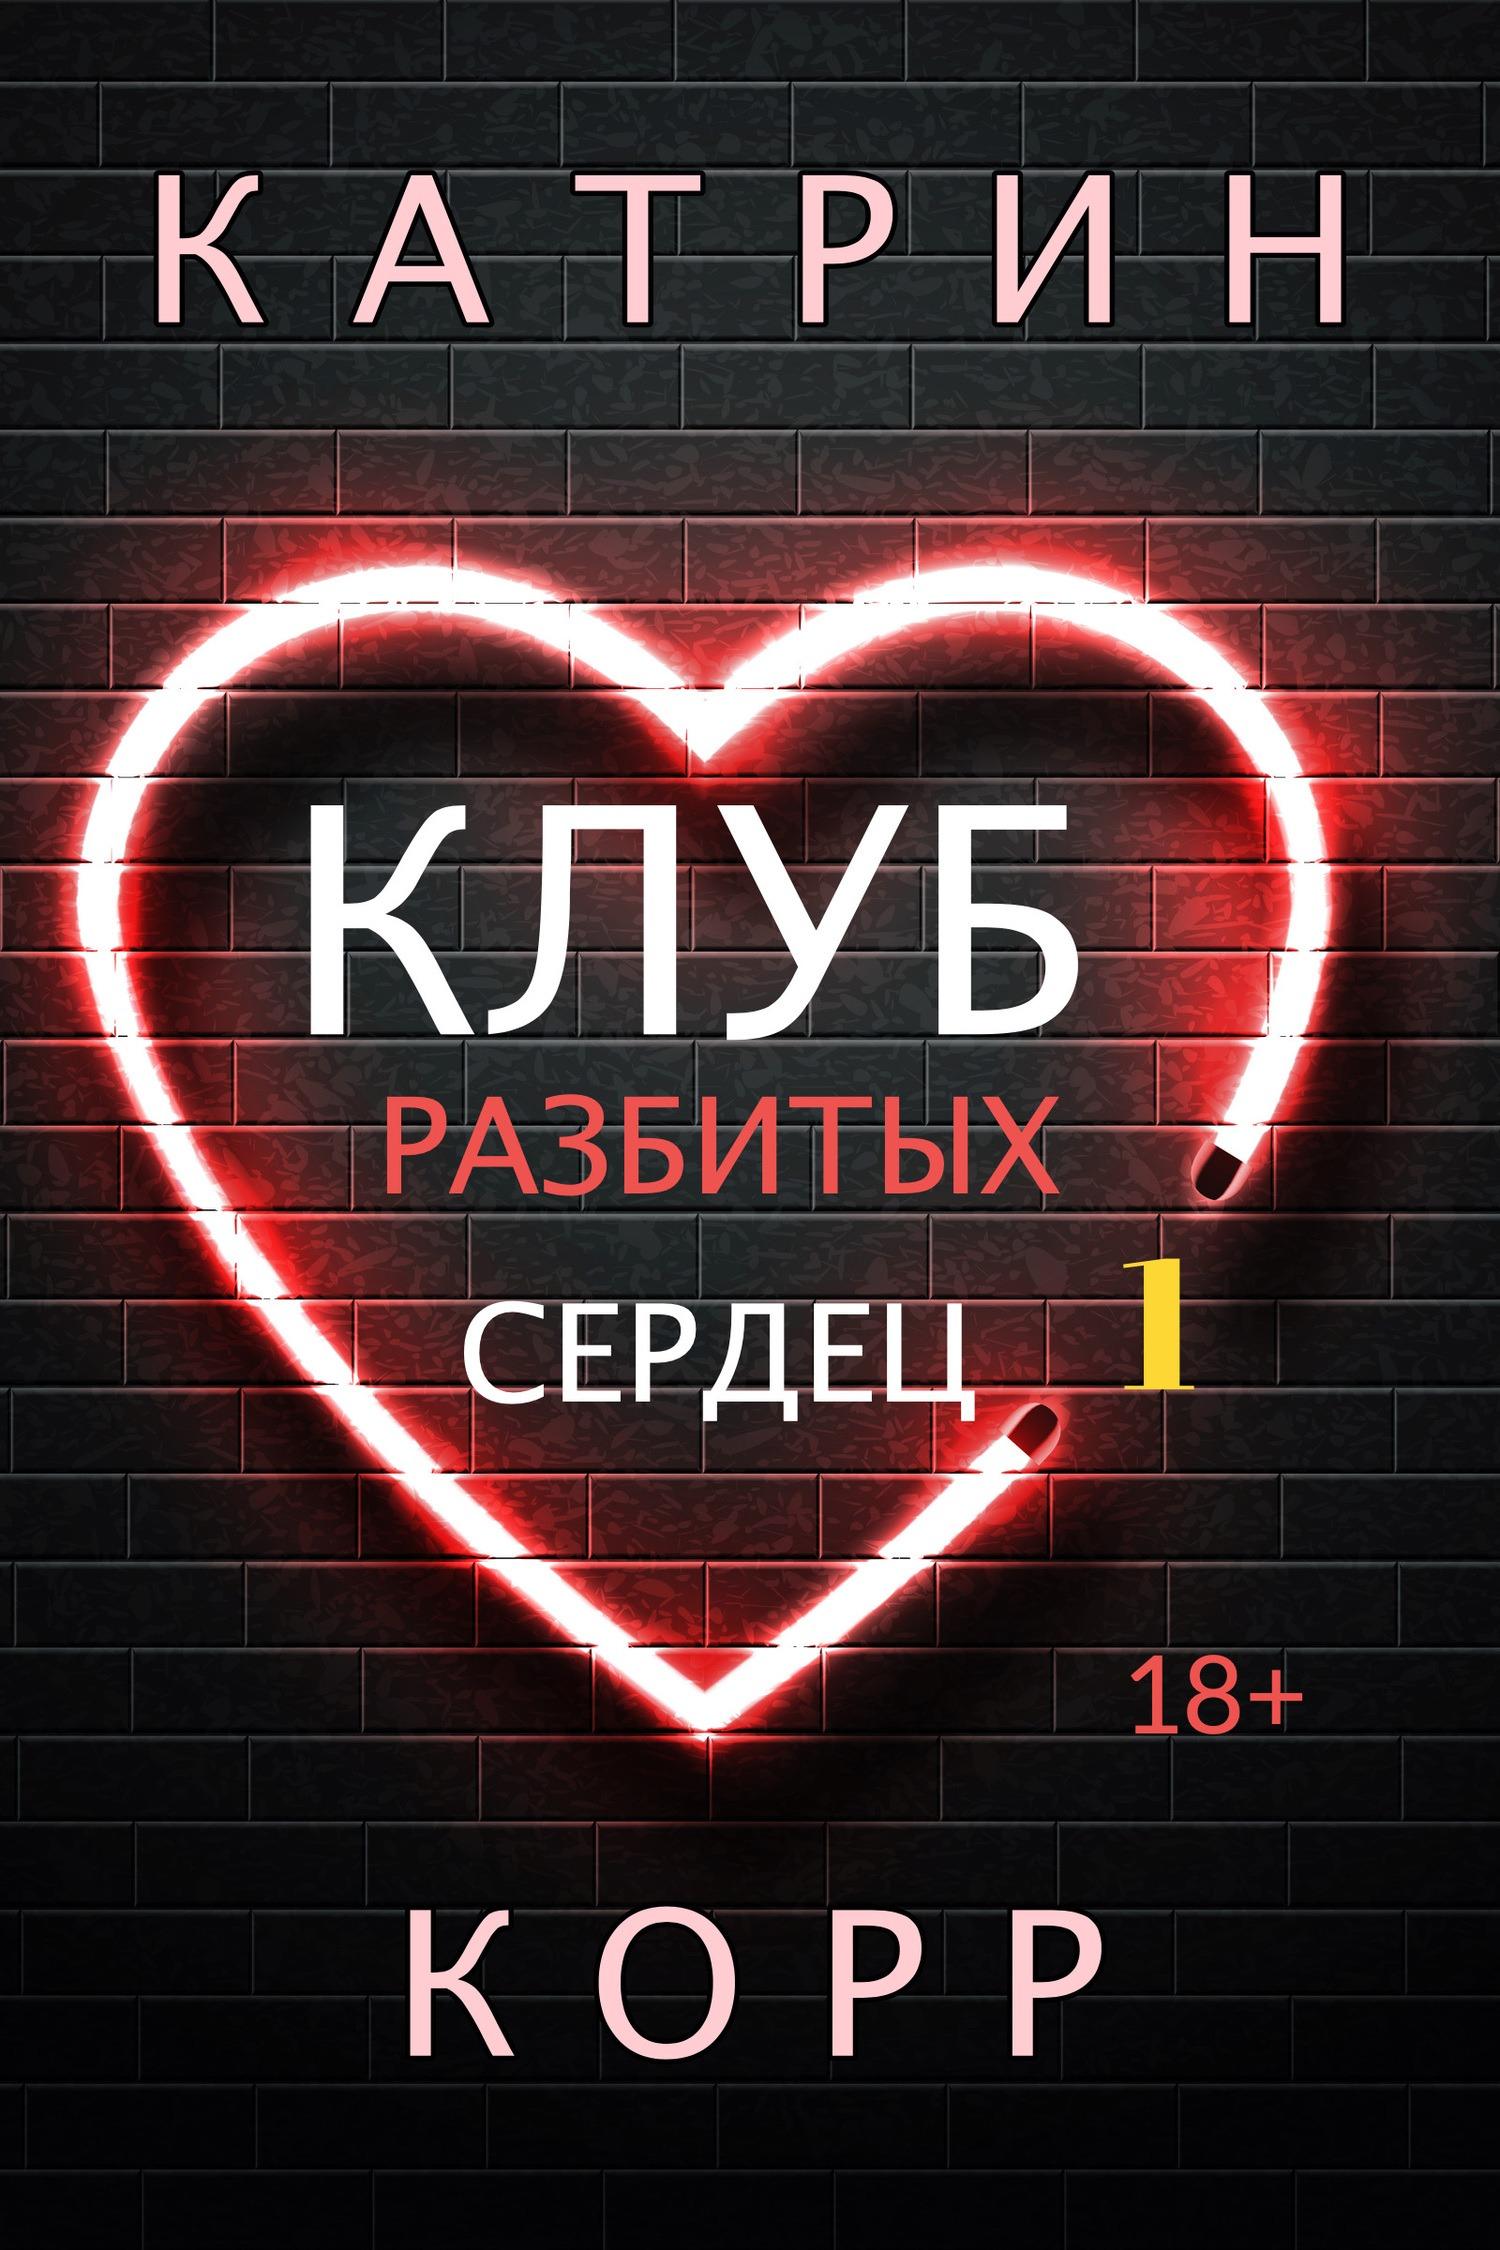 Клуб разбитых сердец